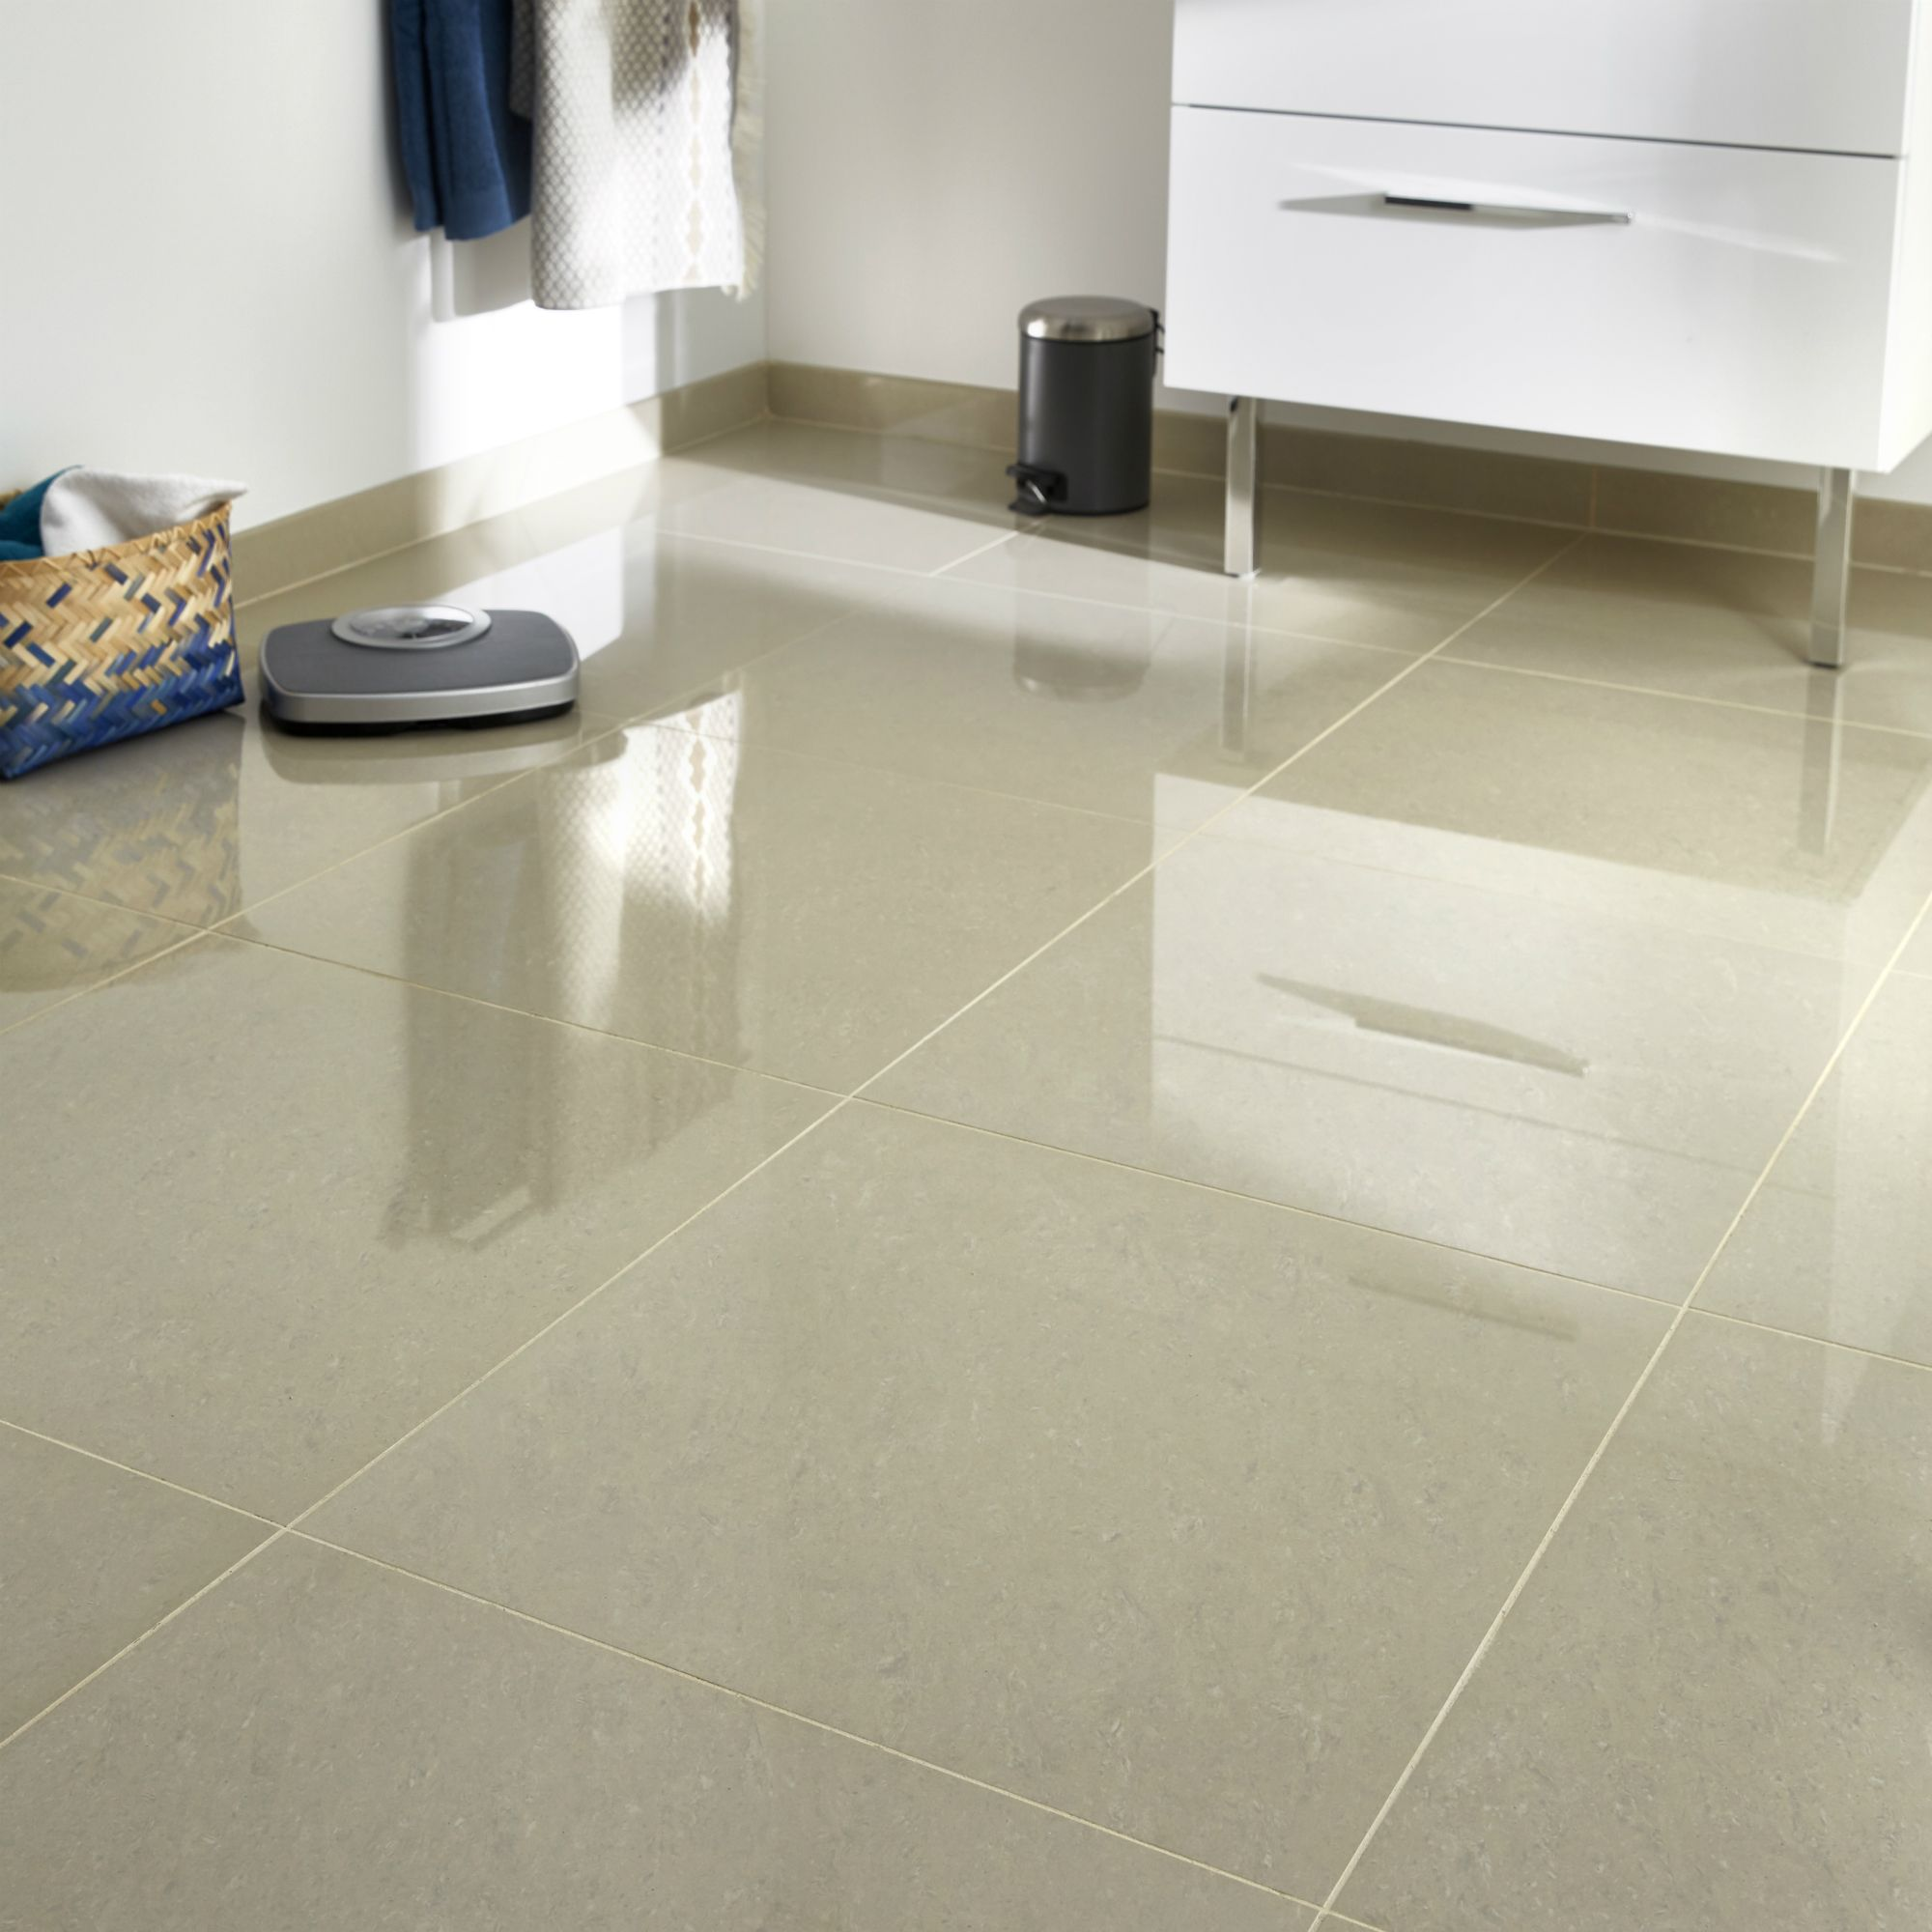 modenia beige travertine effect porcelain floor tile pack of 3 l 600mm w 600mm